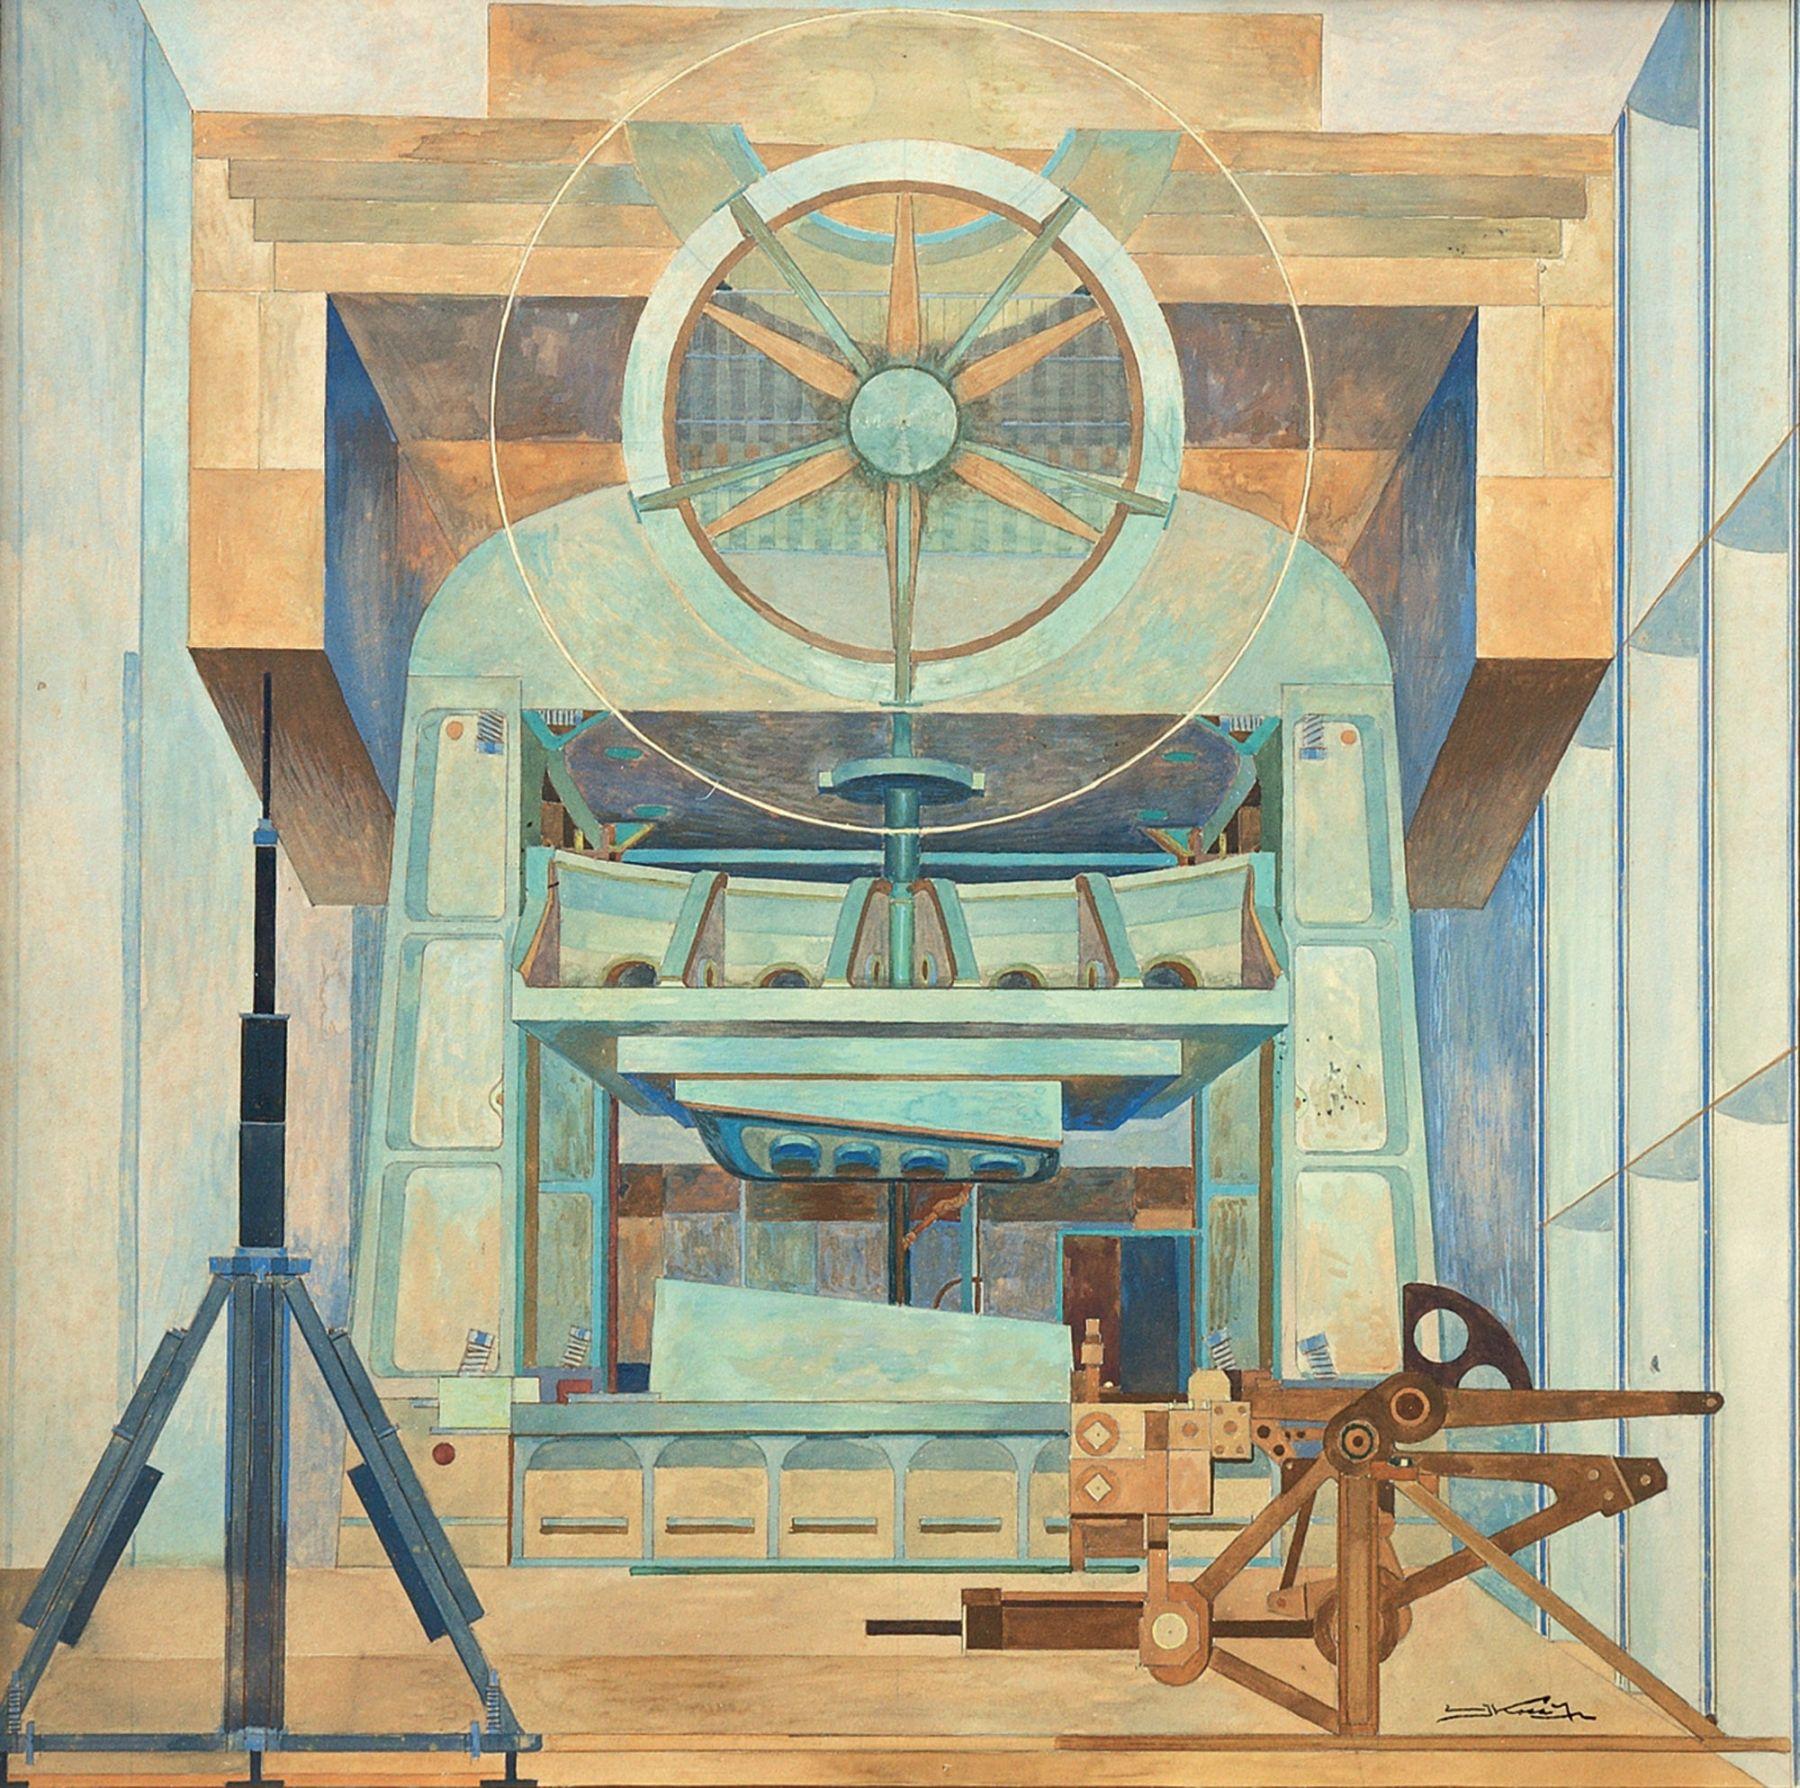 EMIL KOSA, JR. (1903-1968), Mural Study for Lockheed Aircraft Corporation, 1954